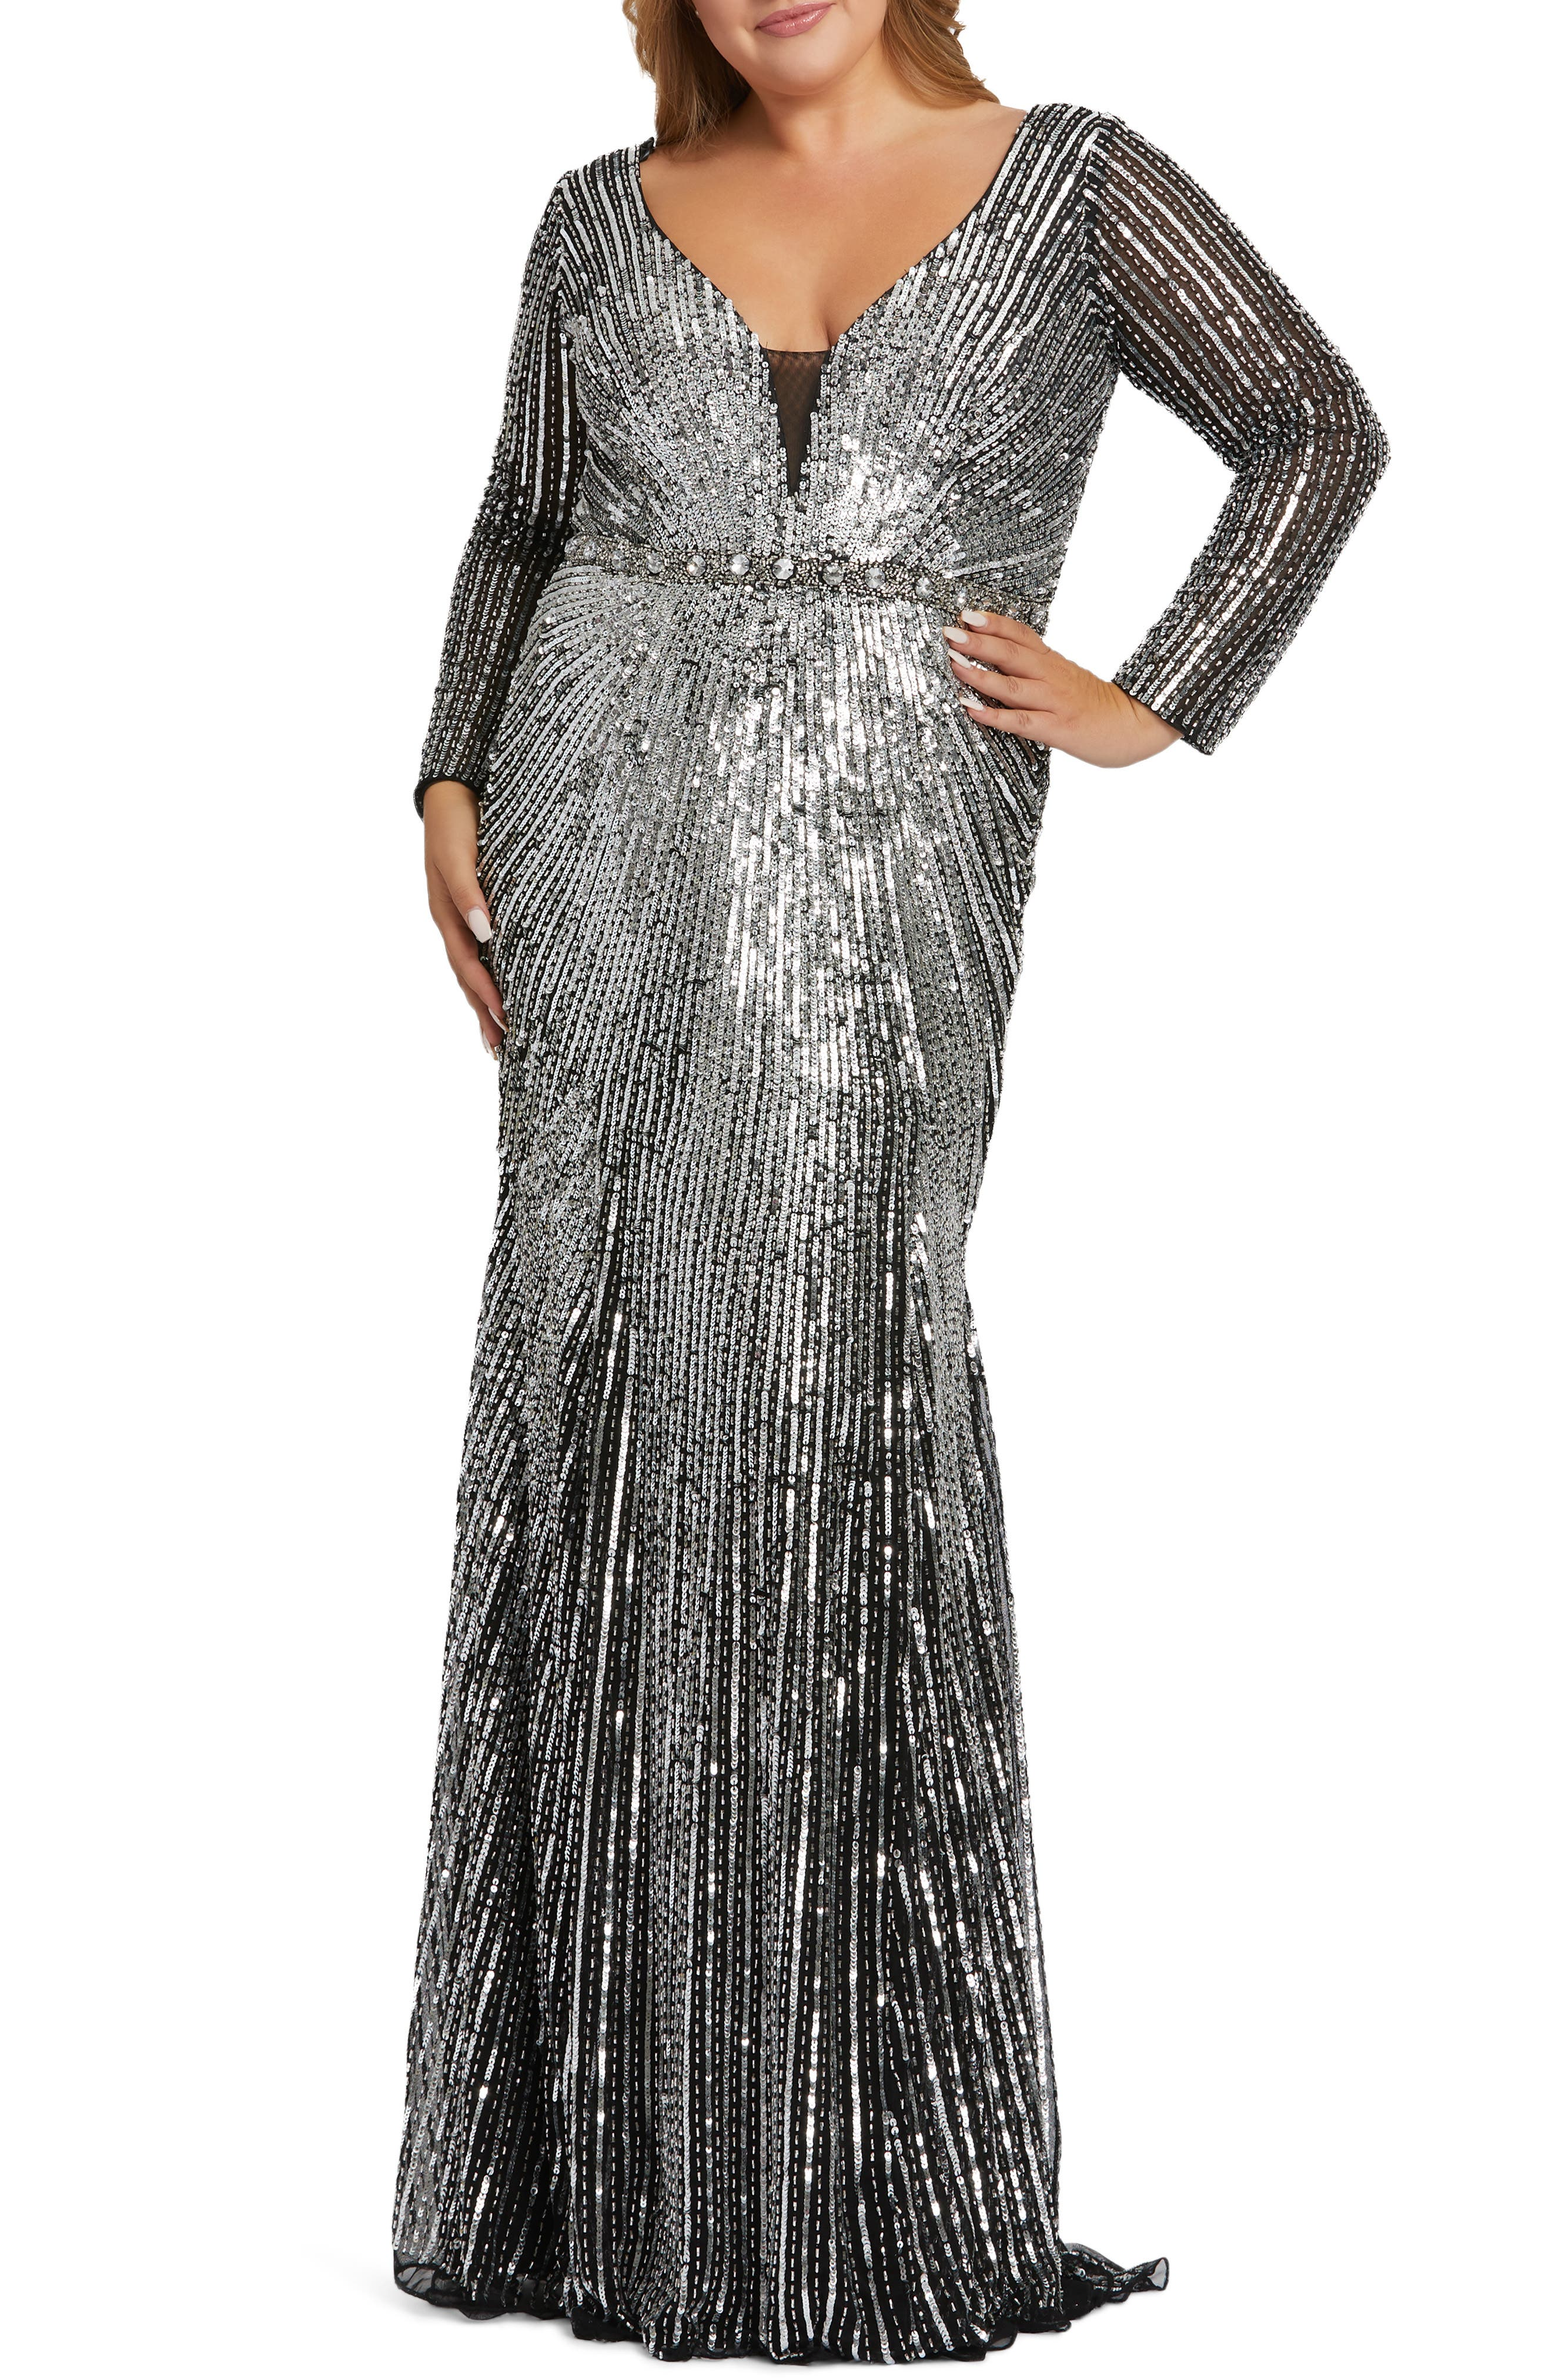 70s Dresses – Disco Dress, Hippie Dress, Wrap Dress Plus Size Womens MAC Duggal Starburst Sequin Long Sleeve Trumpet Gown Size 26W - Metallic $598.00 AT vintagedancer.com